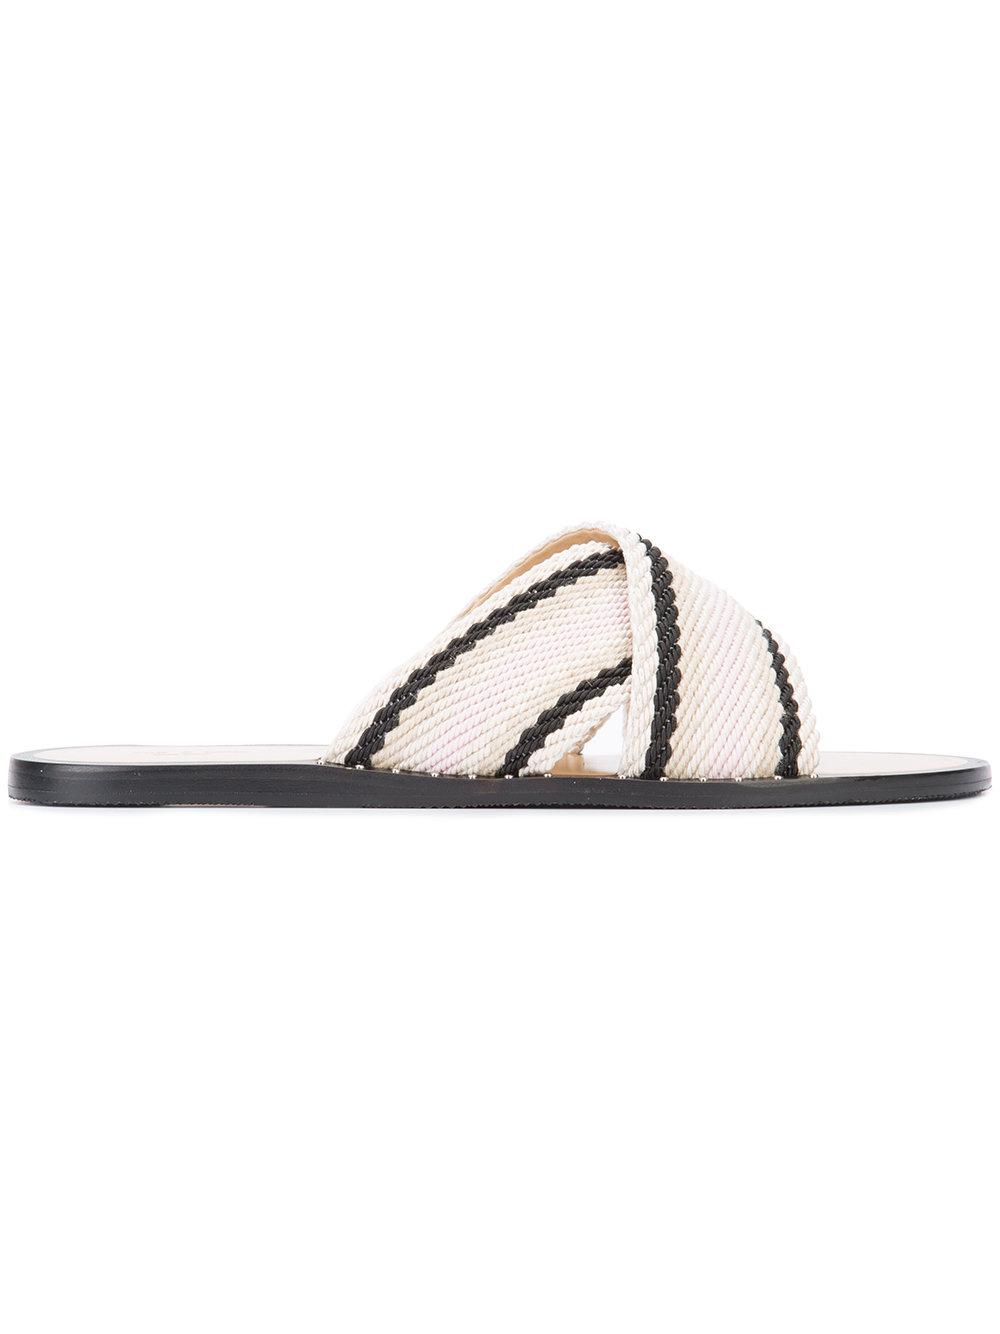 RAG & BONE - criss cross sandals  $250